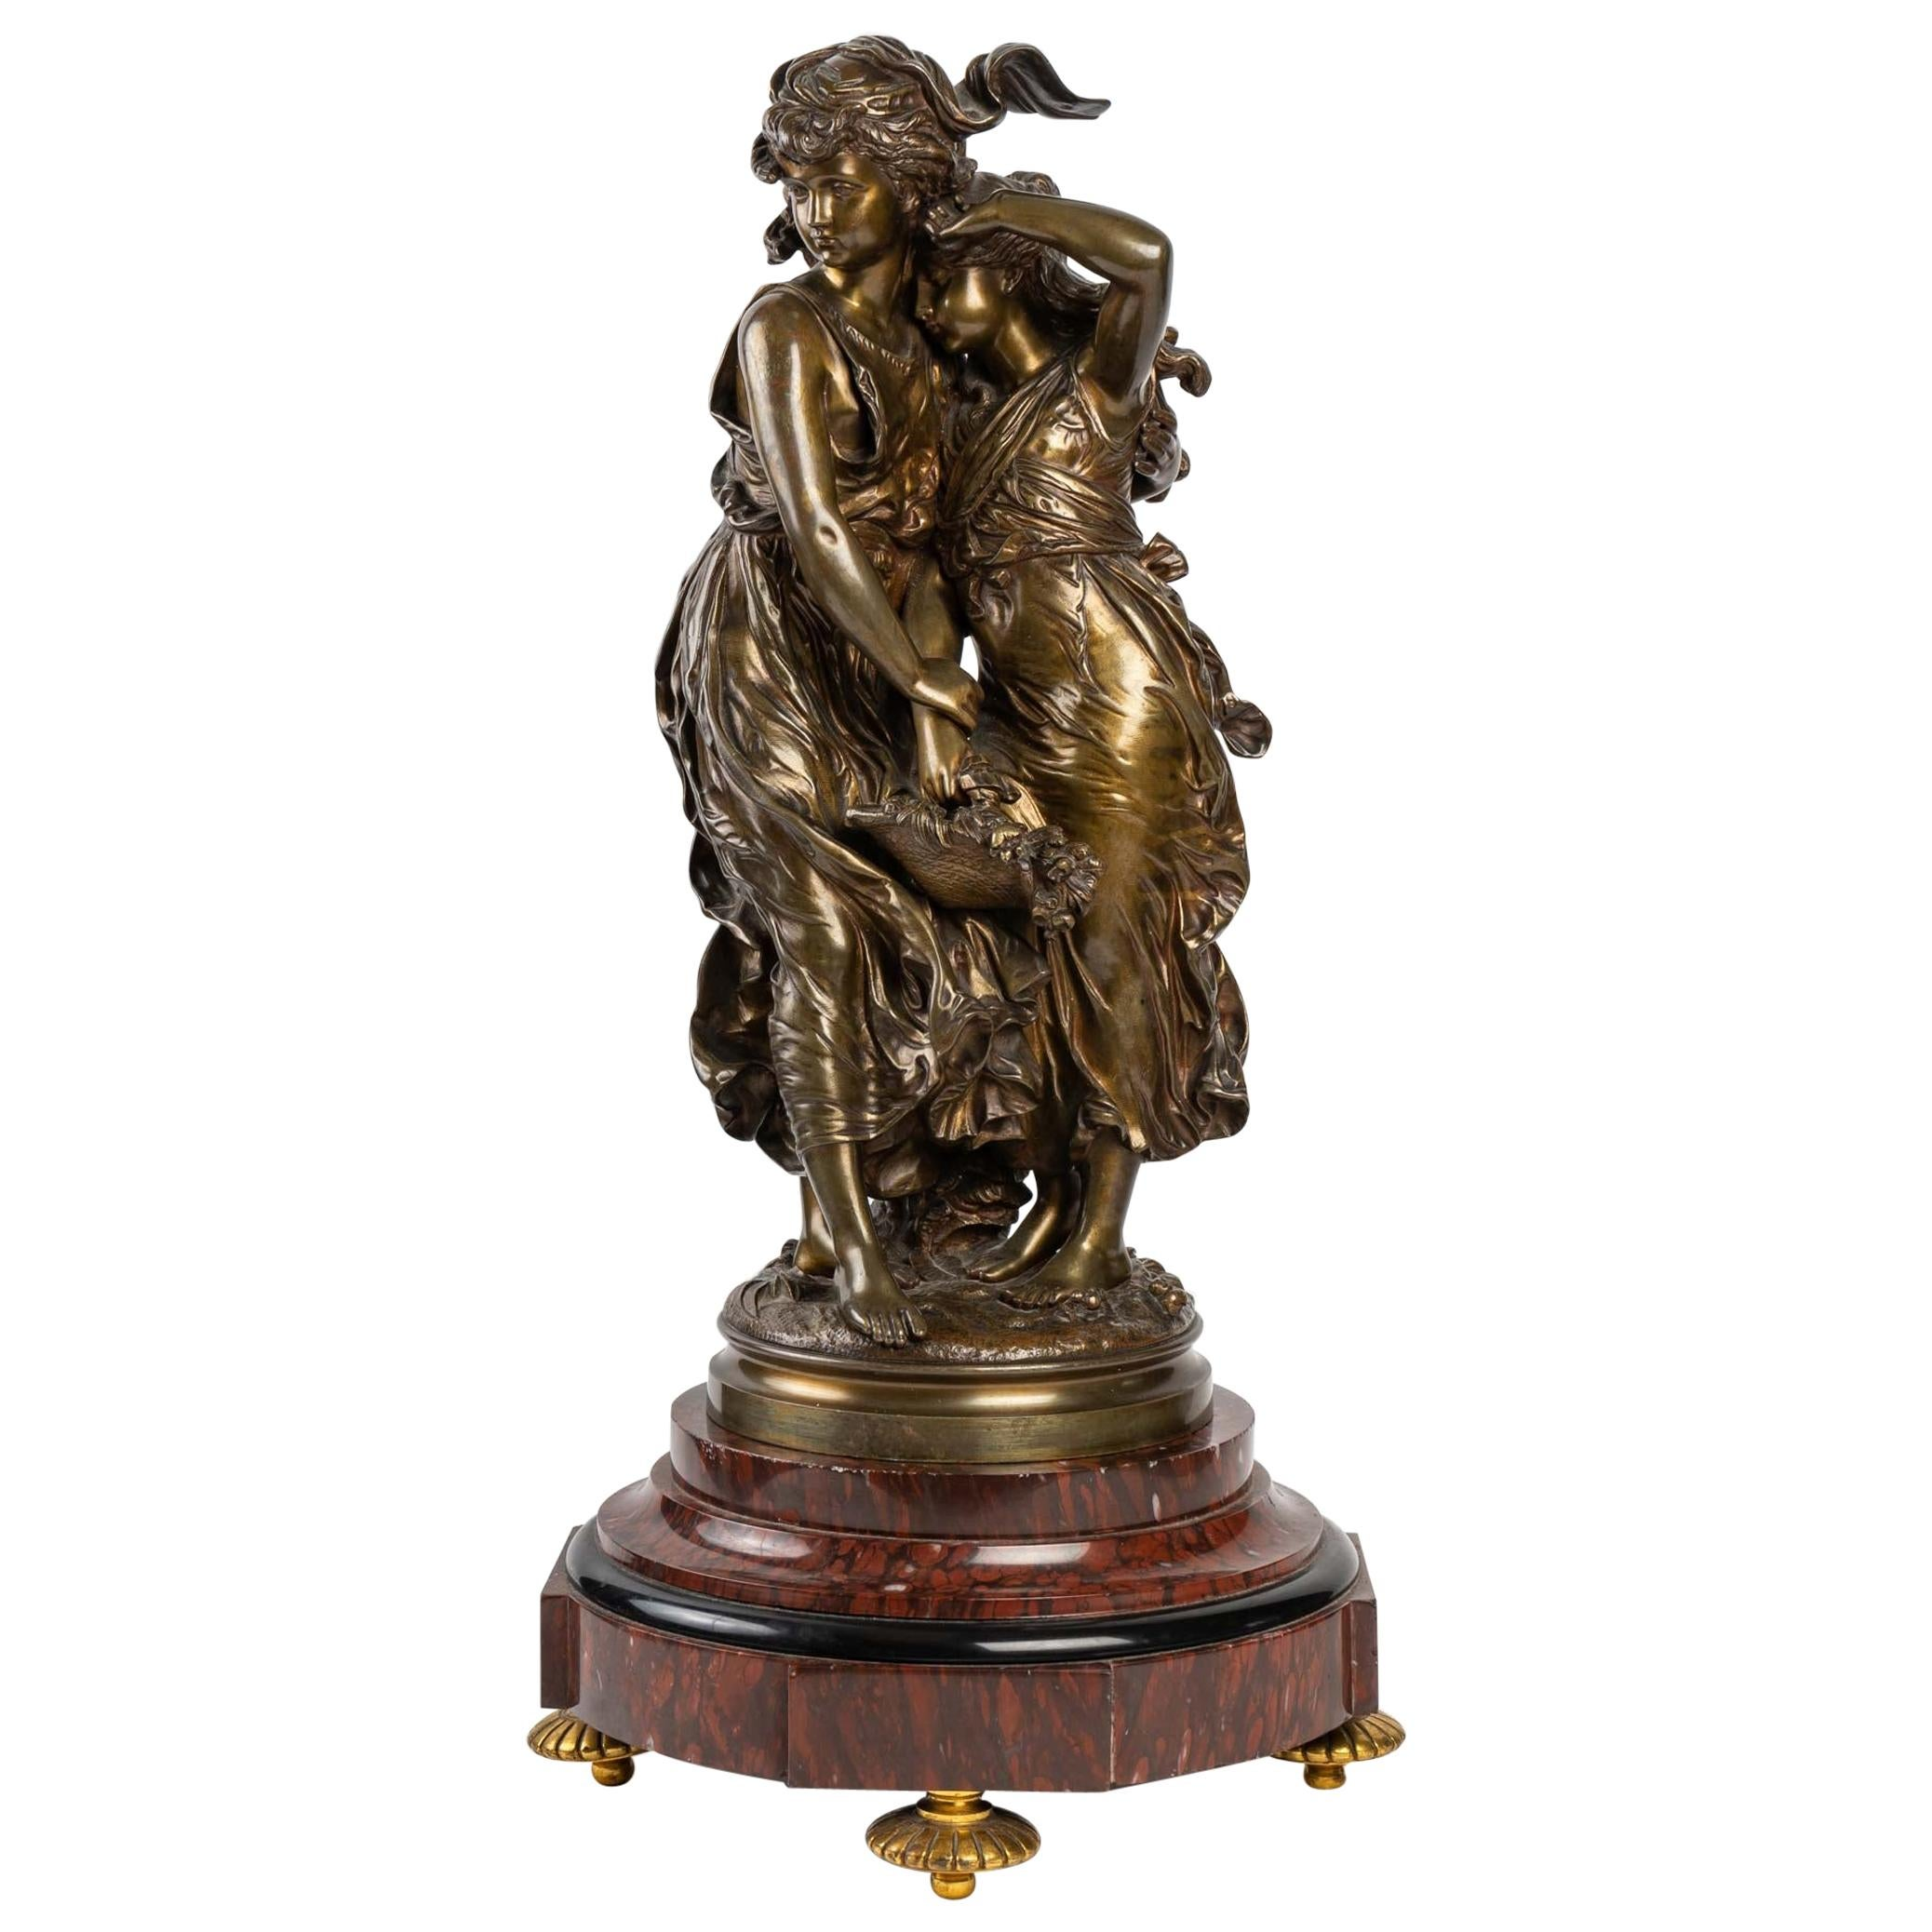 Bronze Statue Signed MOREAU, 19th Century